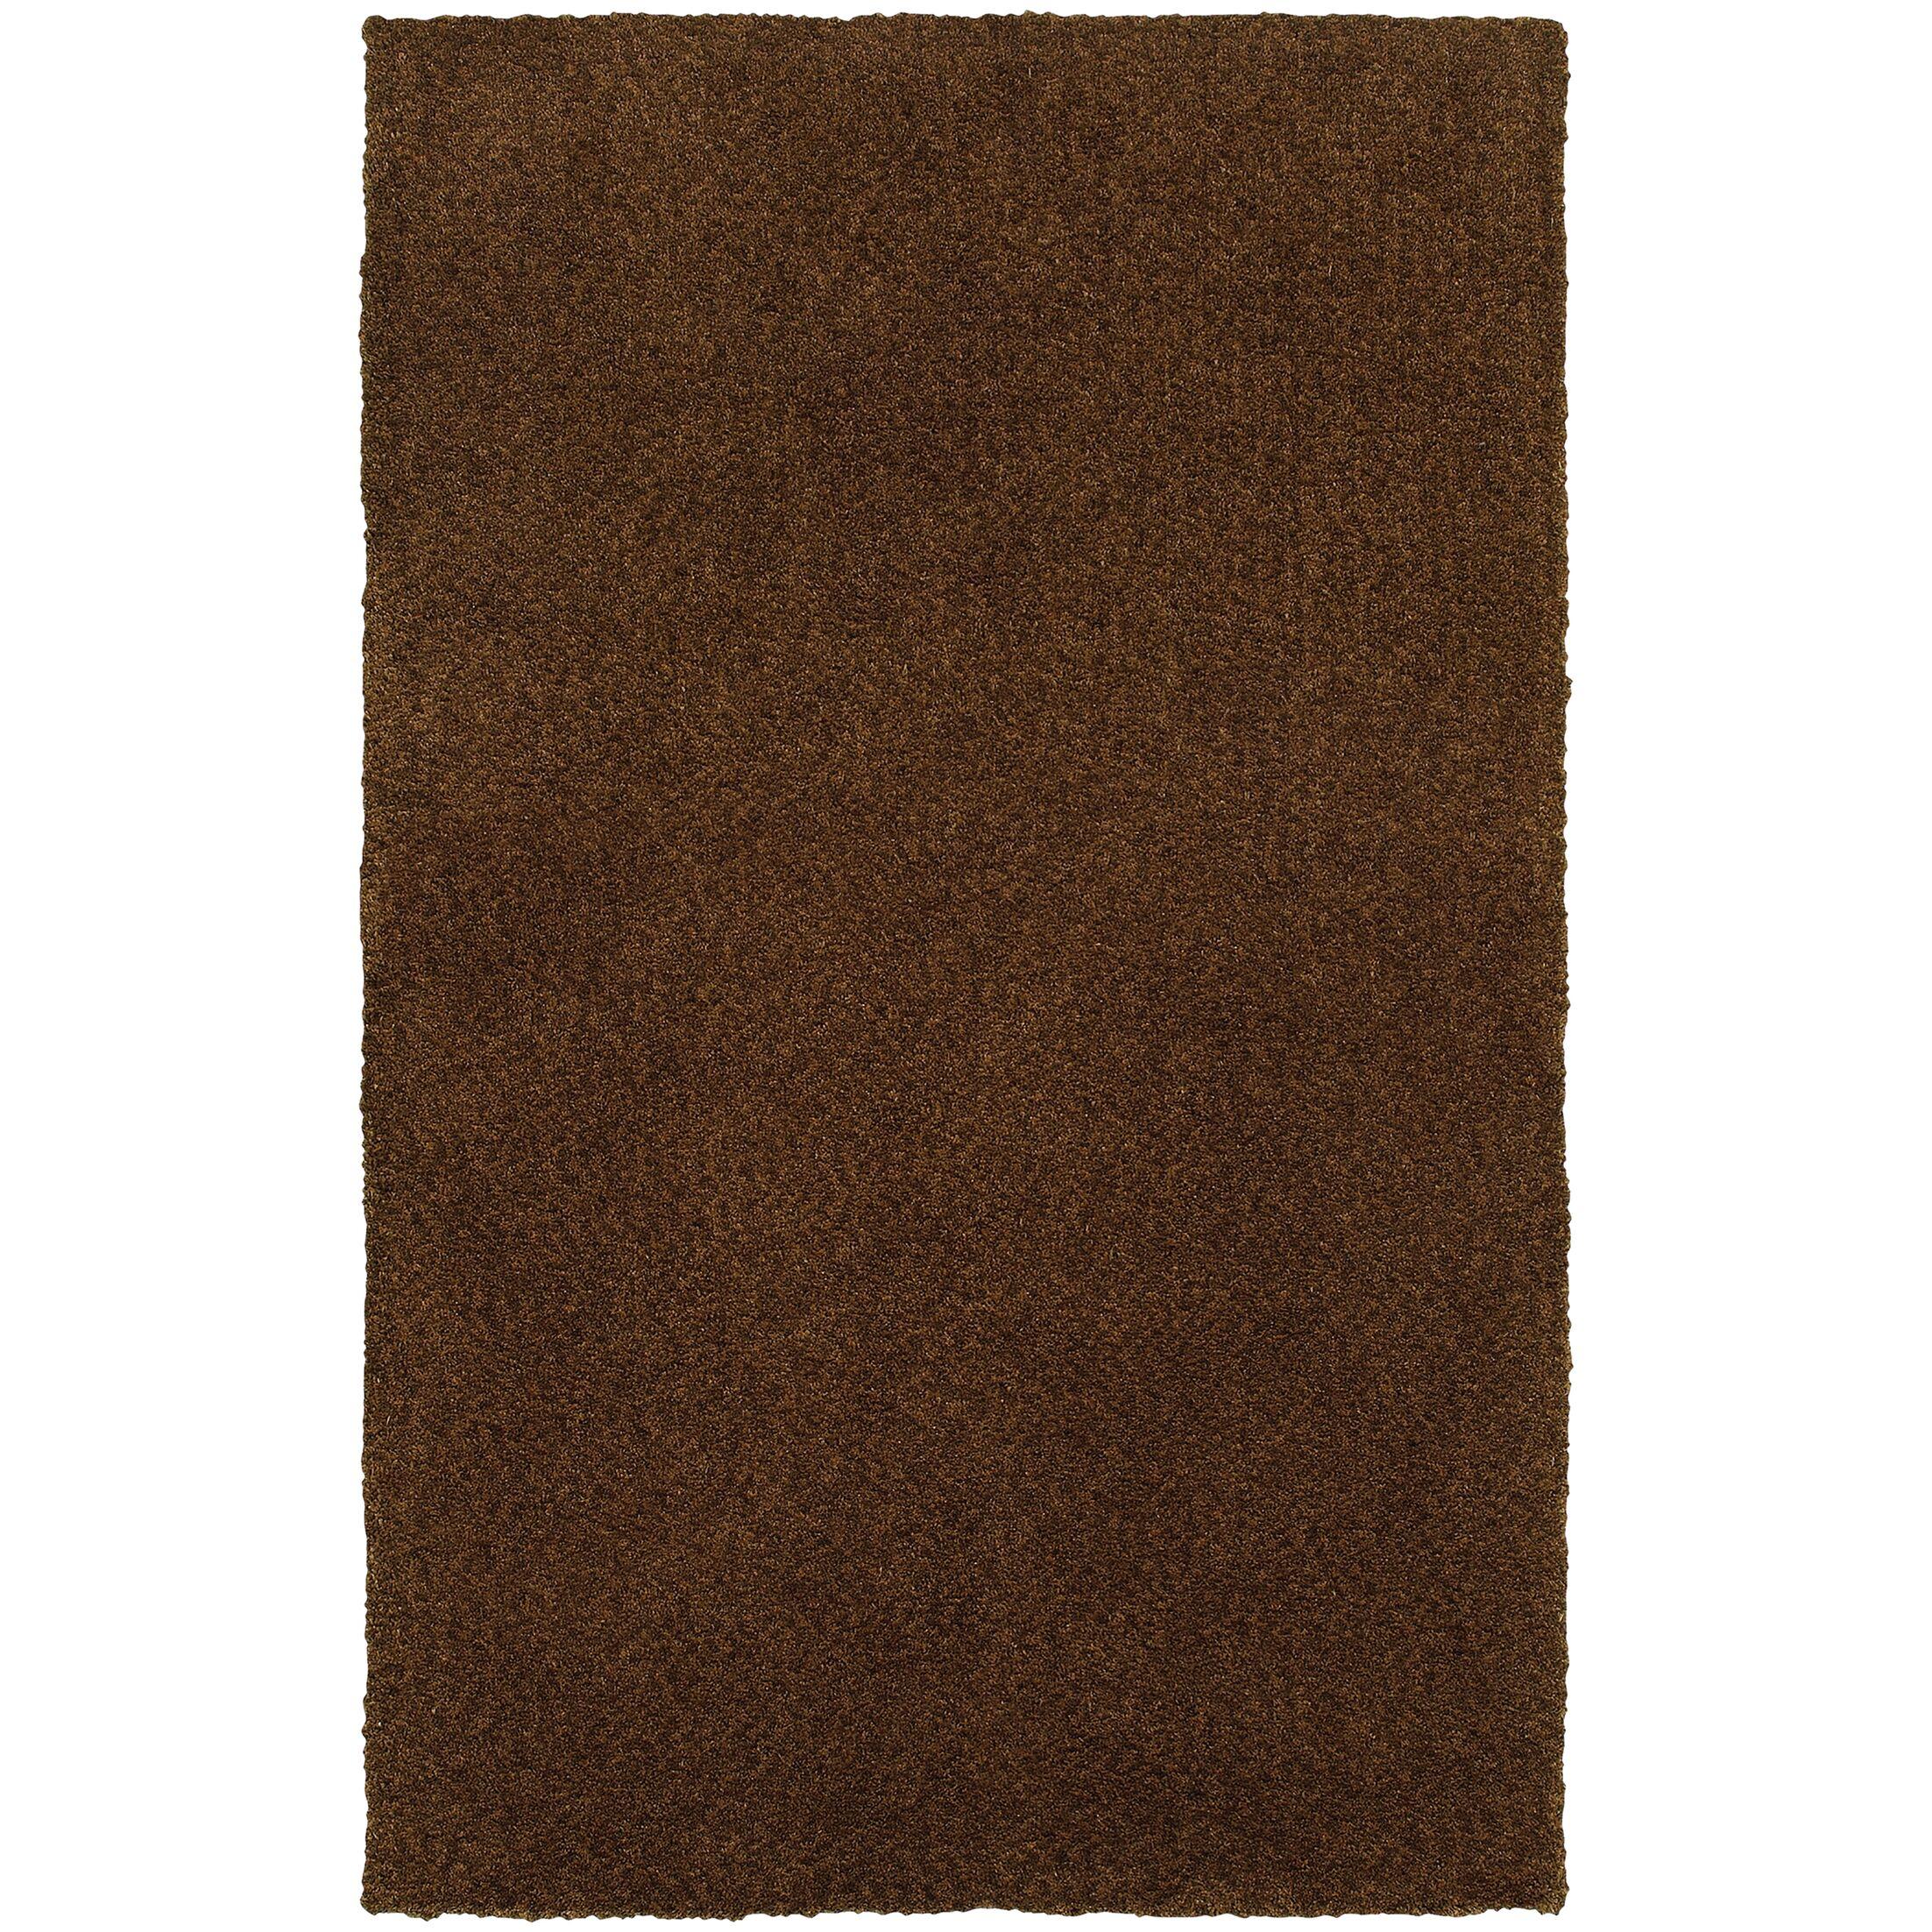 Toronto Hand-Tufted Brown Area Rug Rug Size: Rectangle 6'6